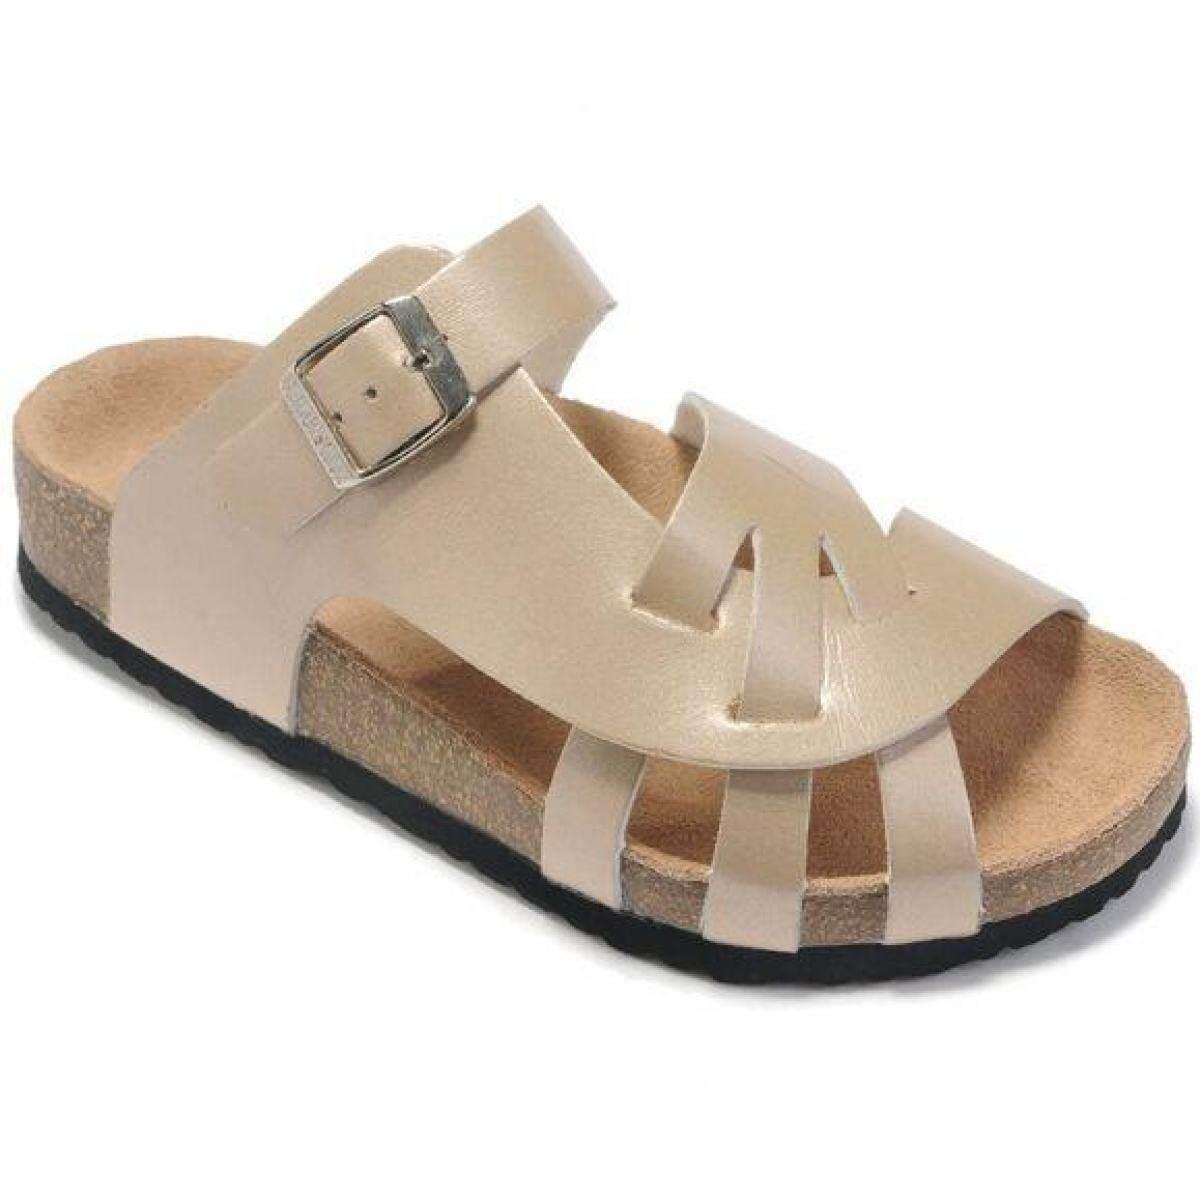 Birkenstock Ramses White Birko Flor Sandal Pria Putih Daftar Harga Whitelust Targaryen Casual Hitam 42 Womens Authentic Pisa Sandals Size 35 41 Beige